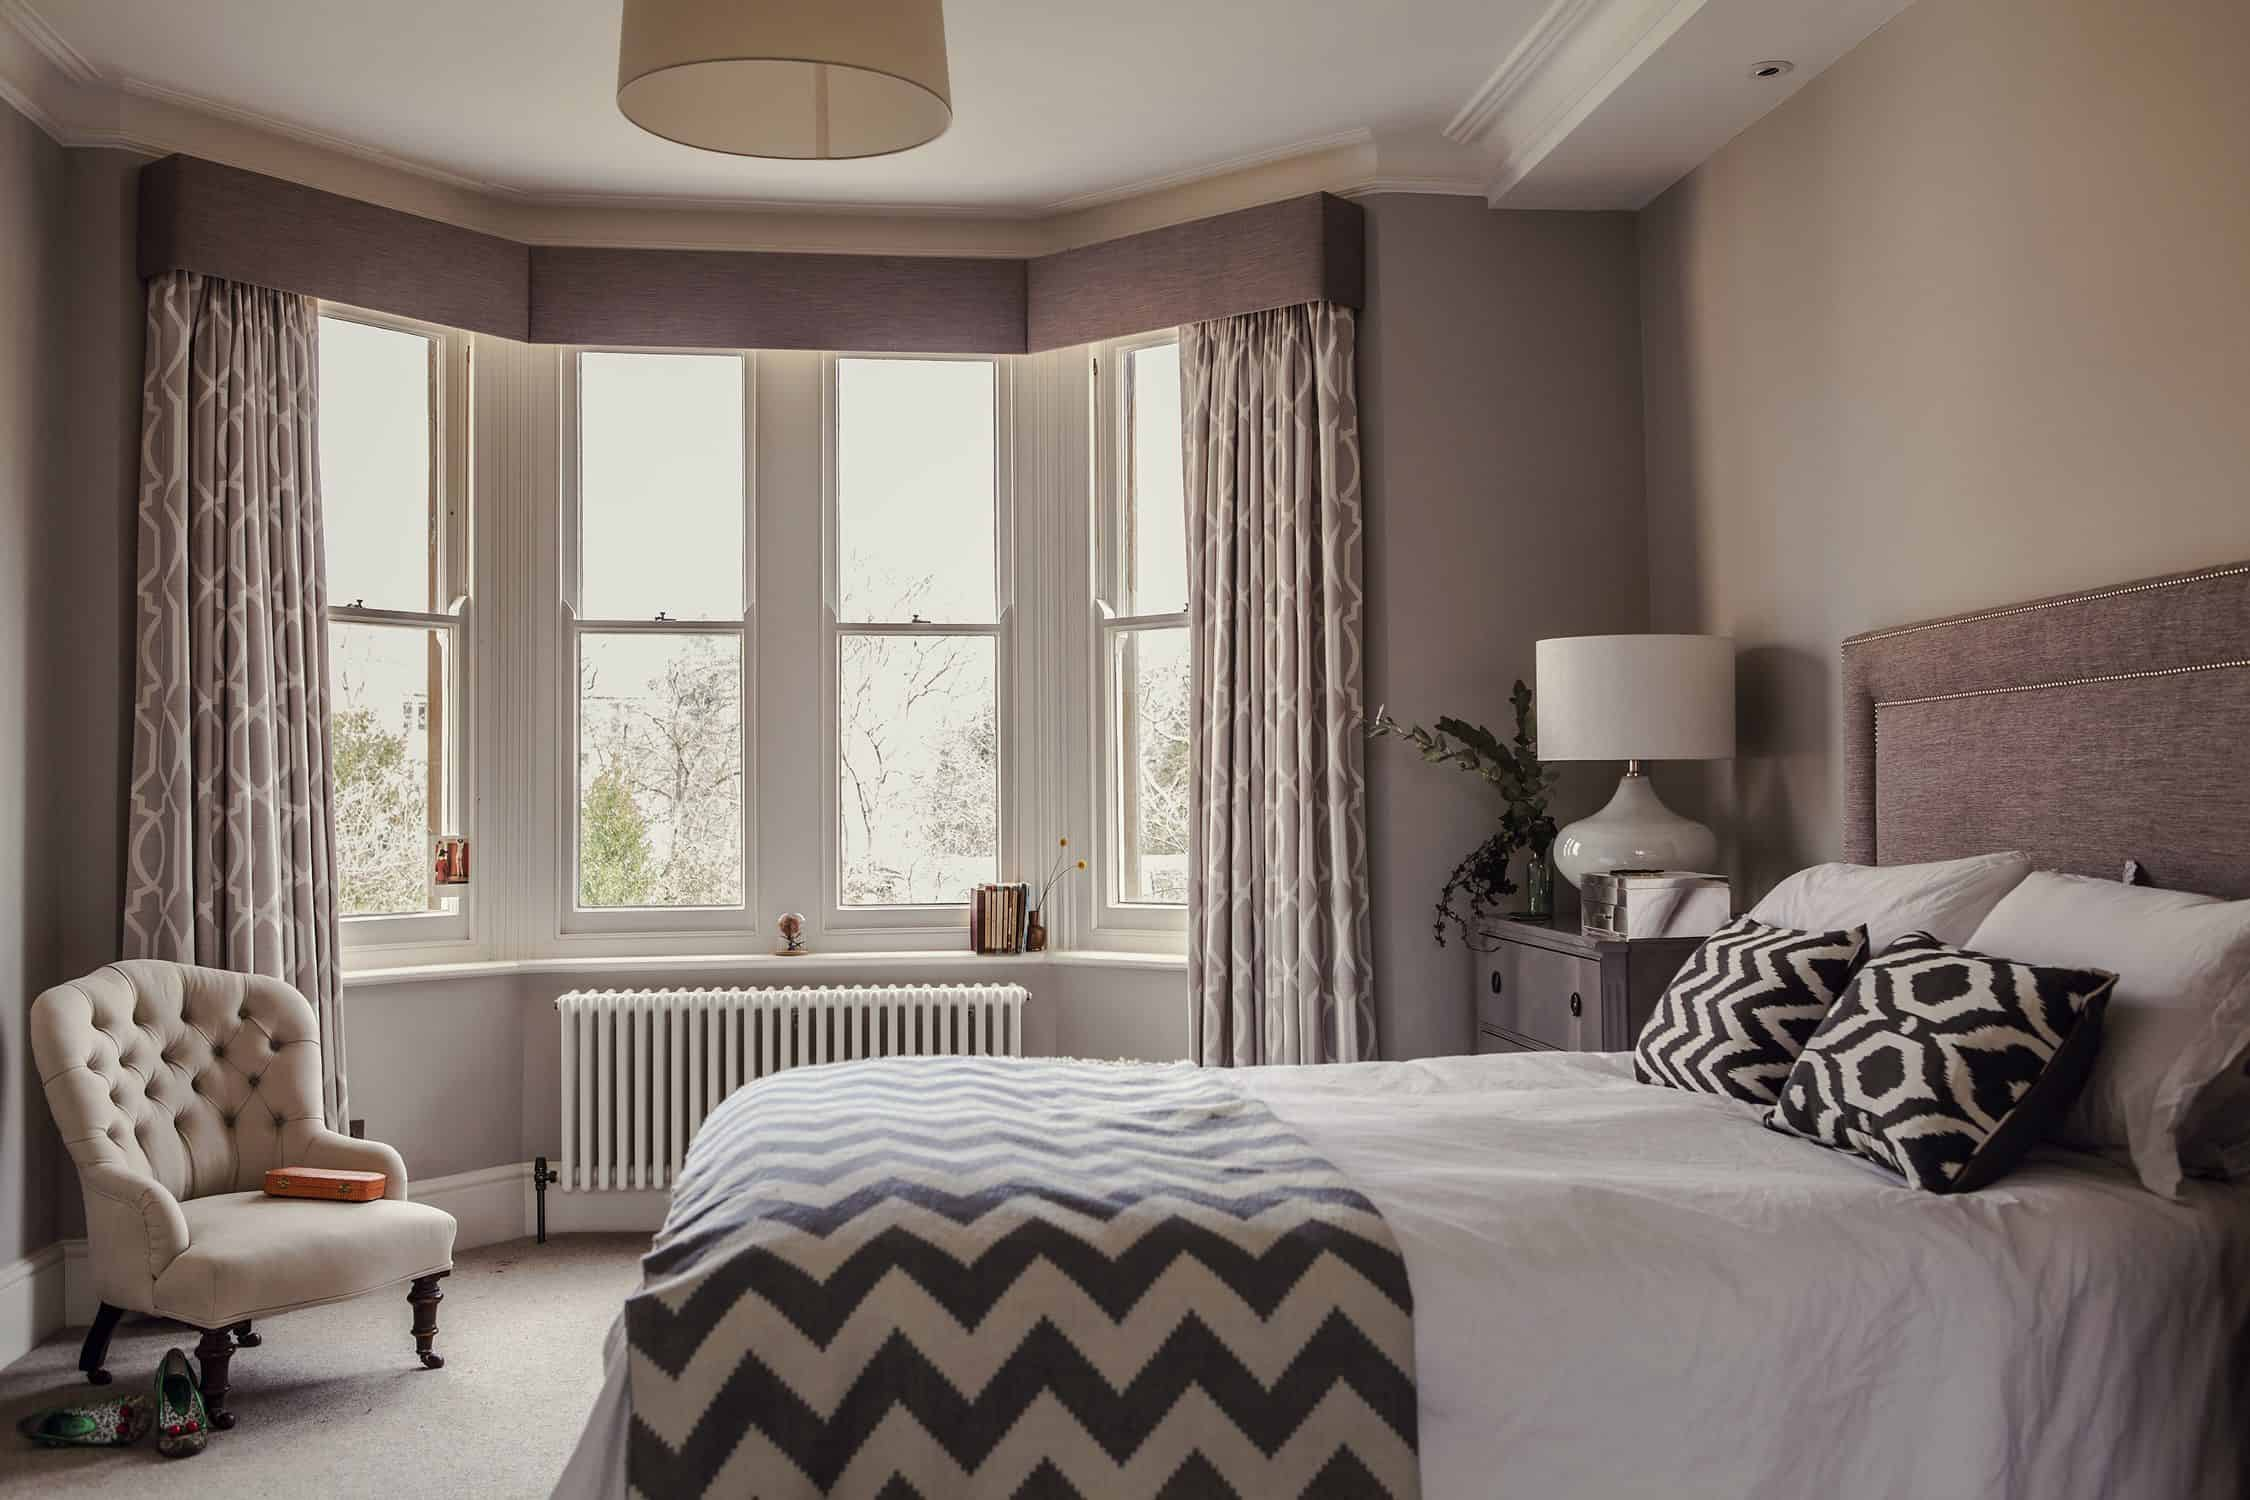 Oxford Family Home-Johnston Parke Interiors-05-1 Kindesign